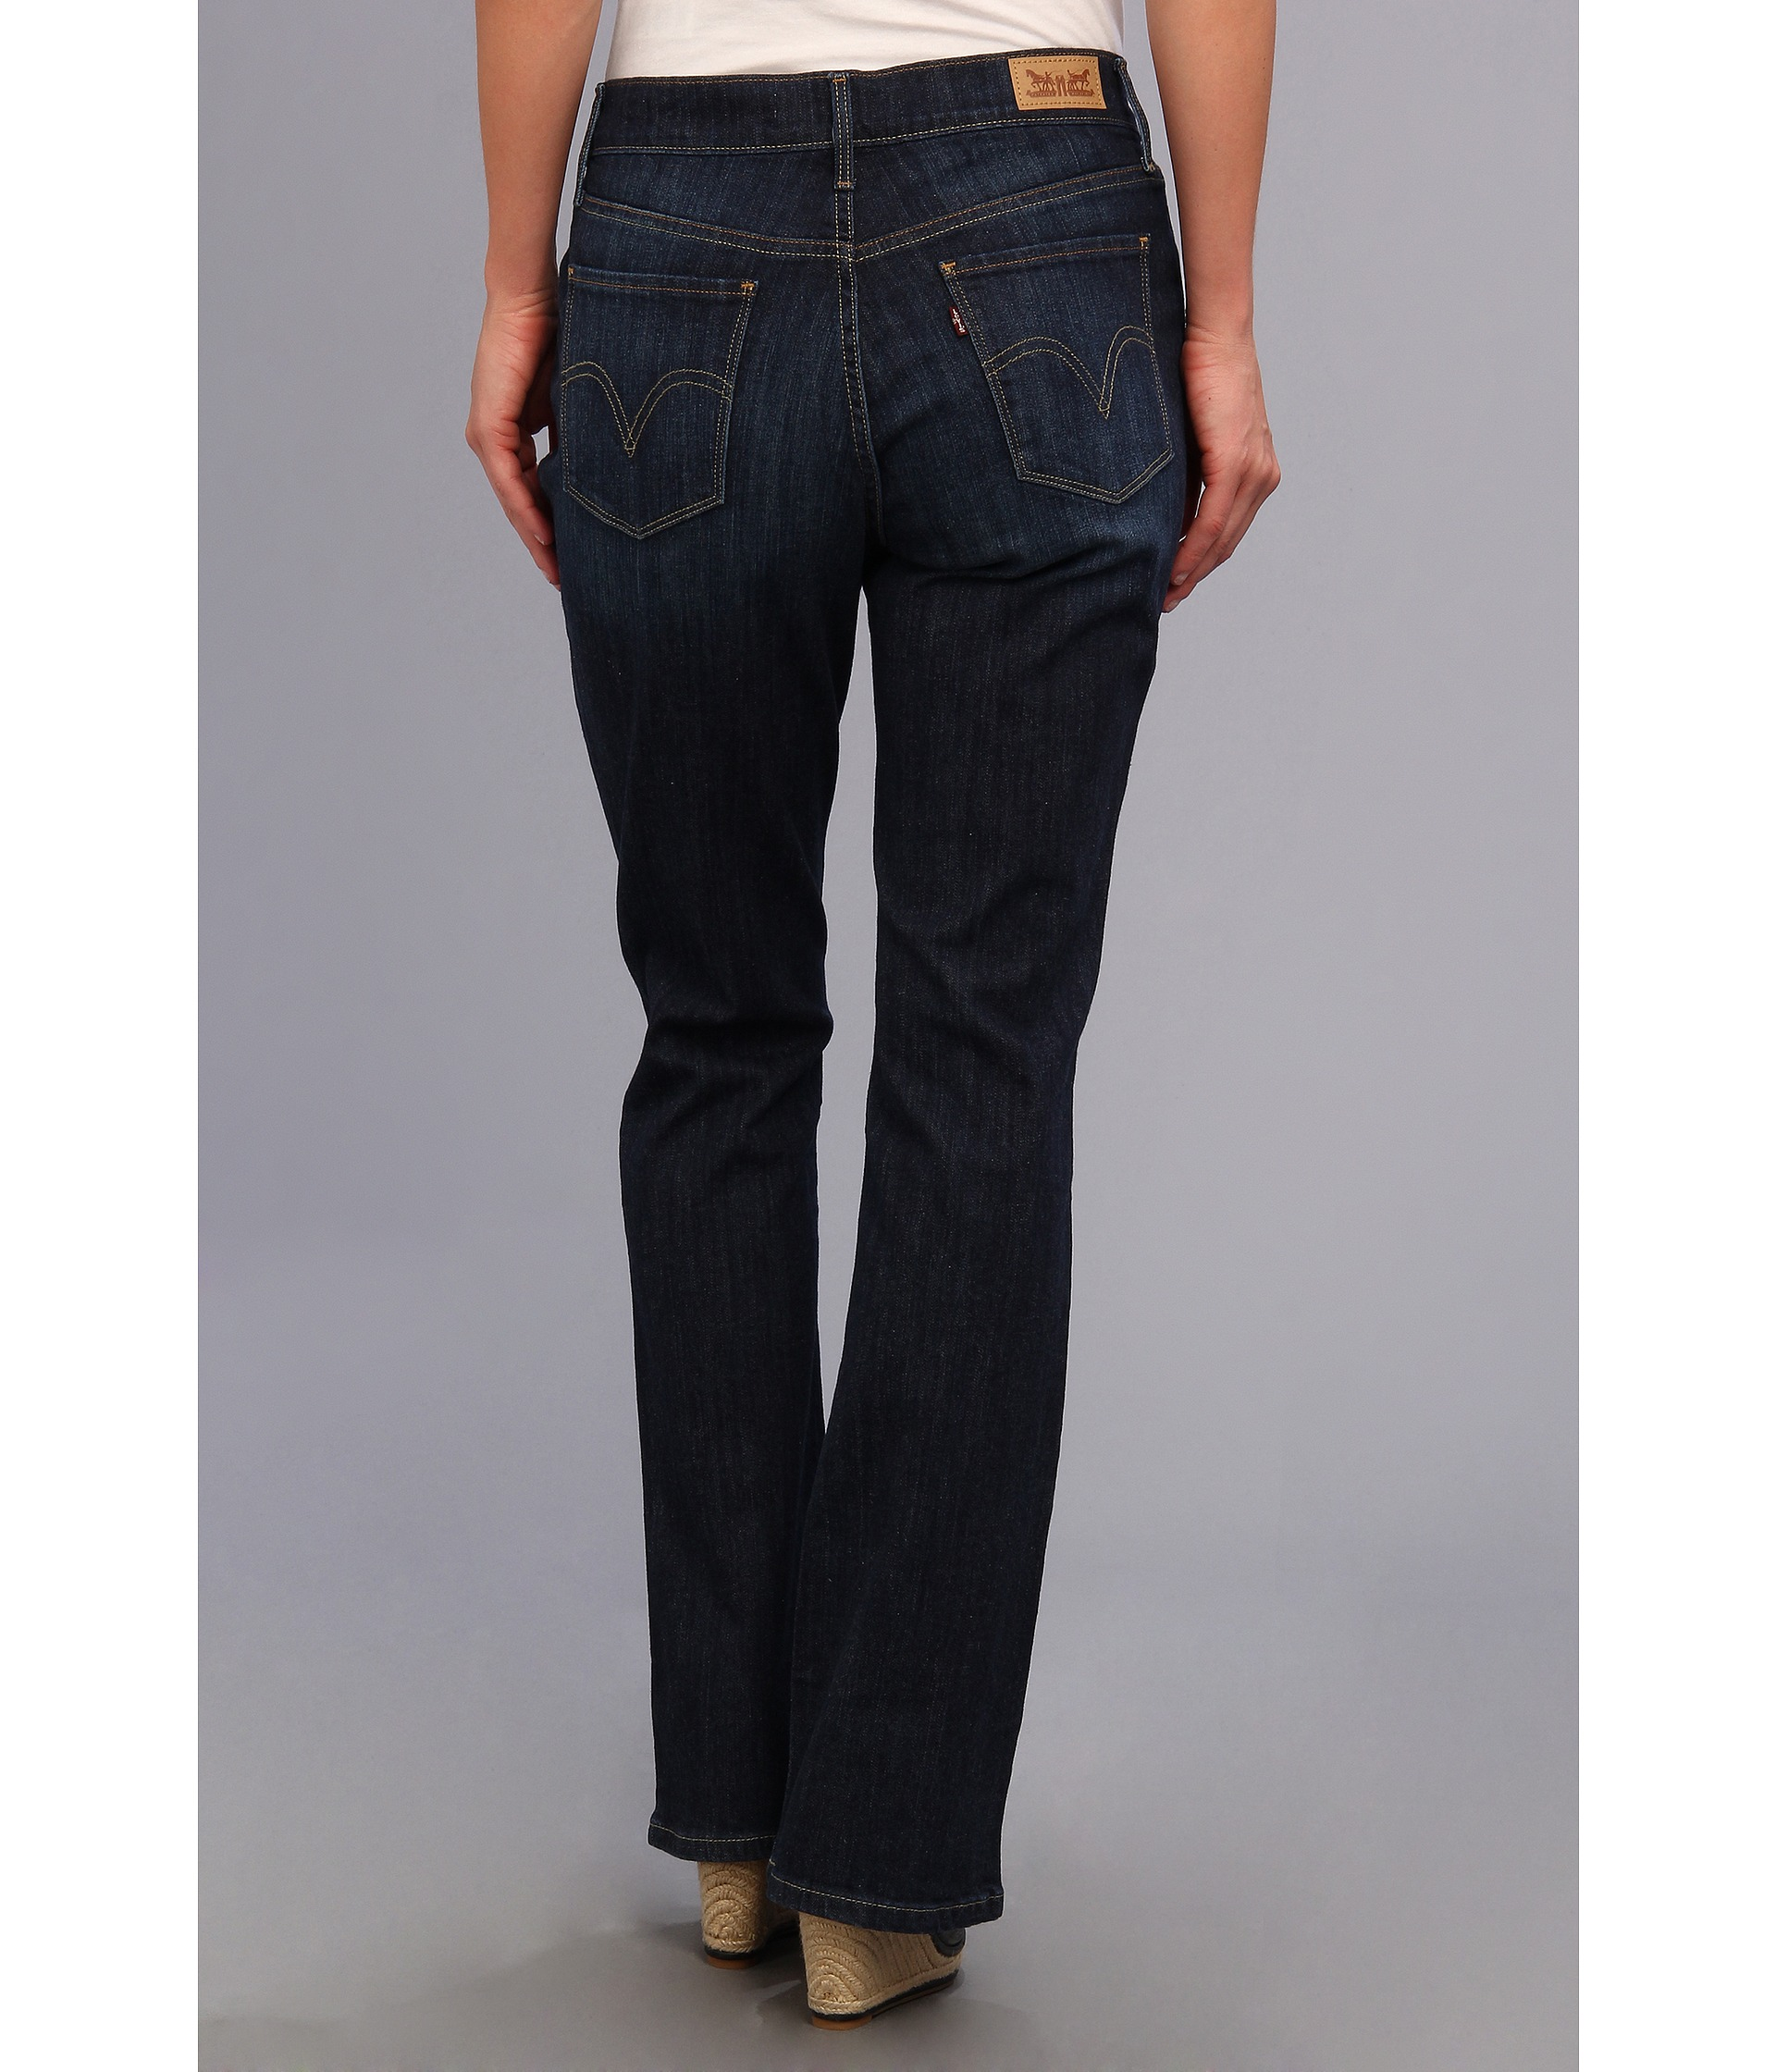 Womens Levi 515 Bootcut Jeans